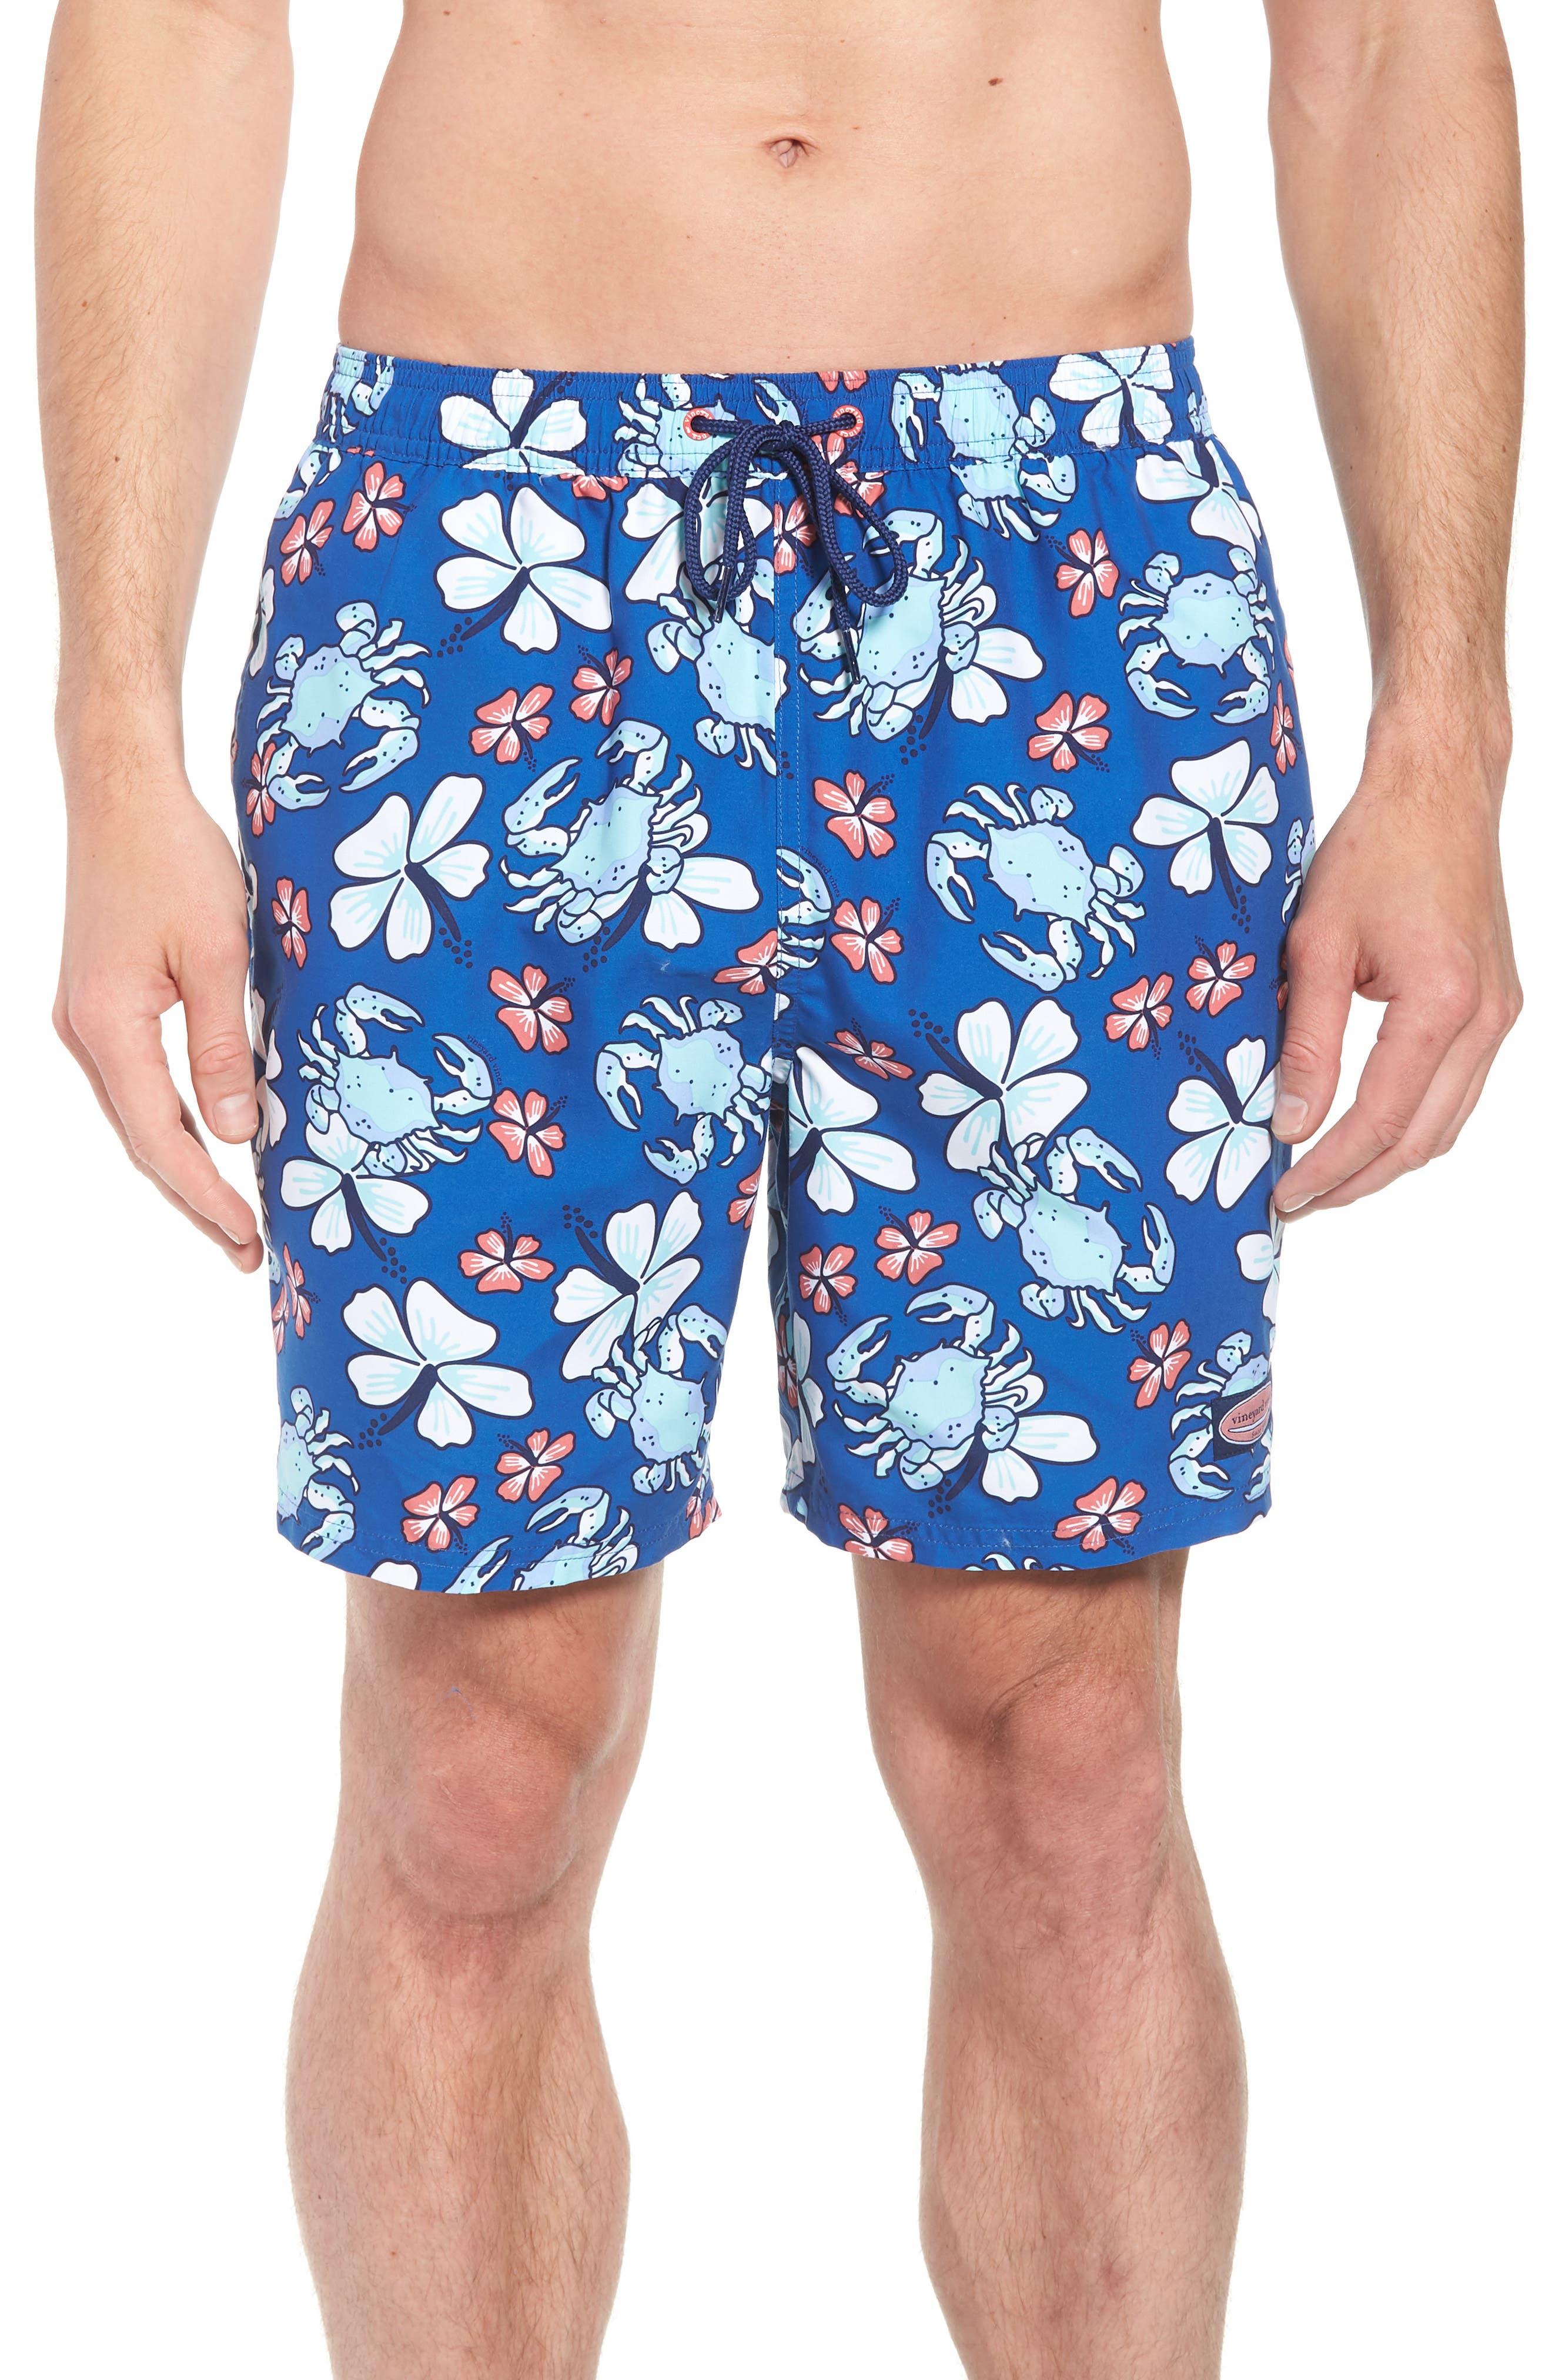 Chappy Crab Floral Swim Trunks,                         Main,                         color, 413